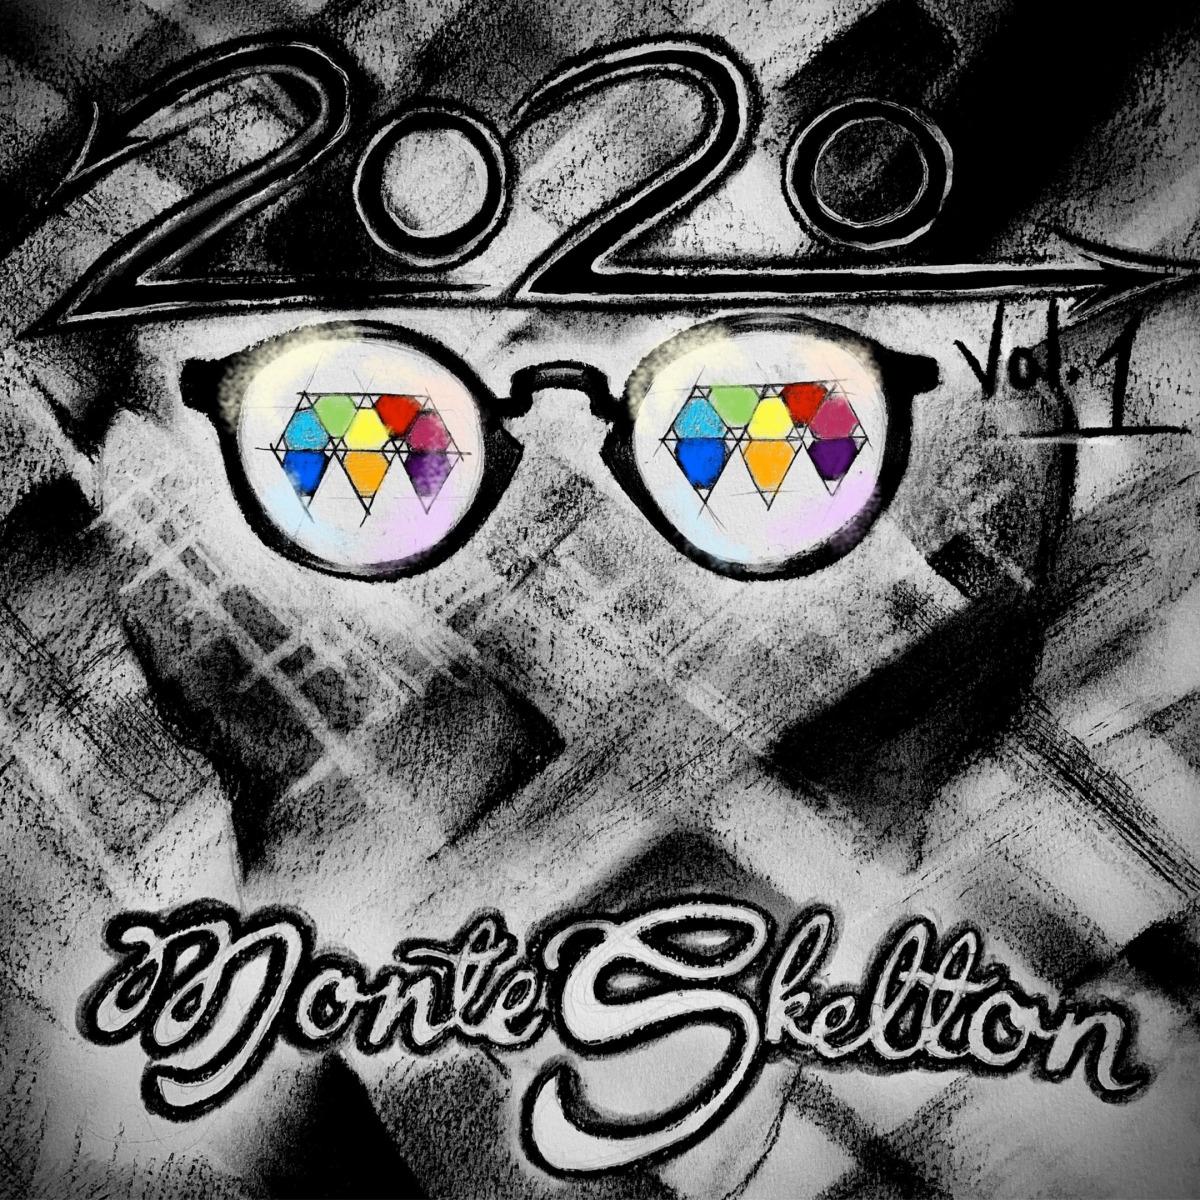 Monte Skelton: 2020 Vol. 1 is FinallyHere!